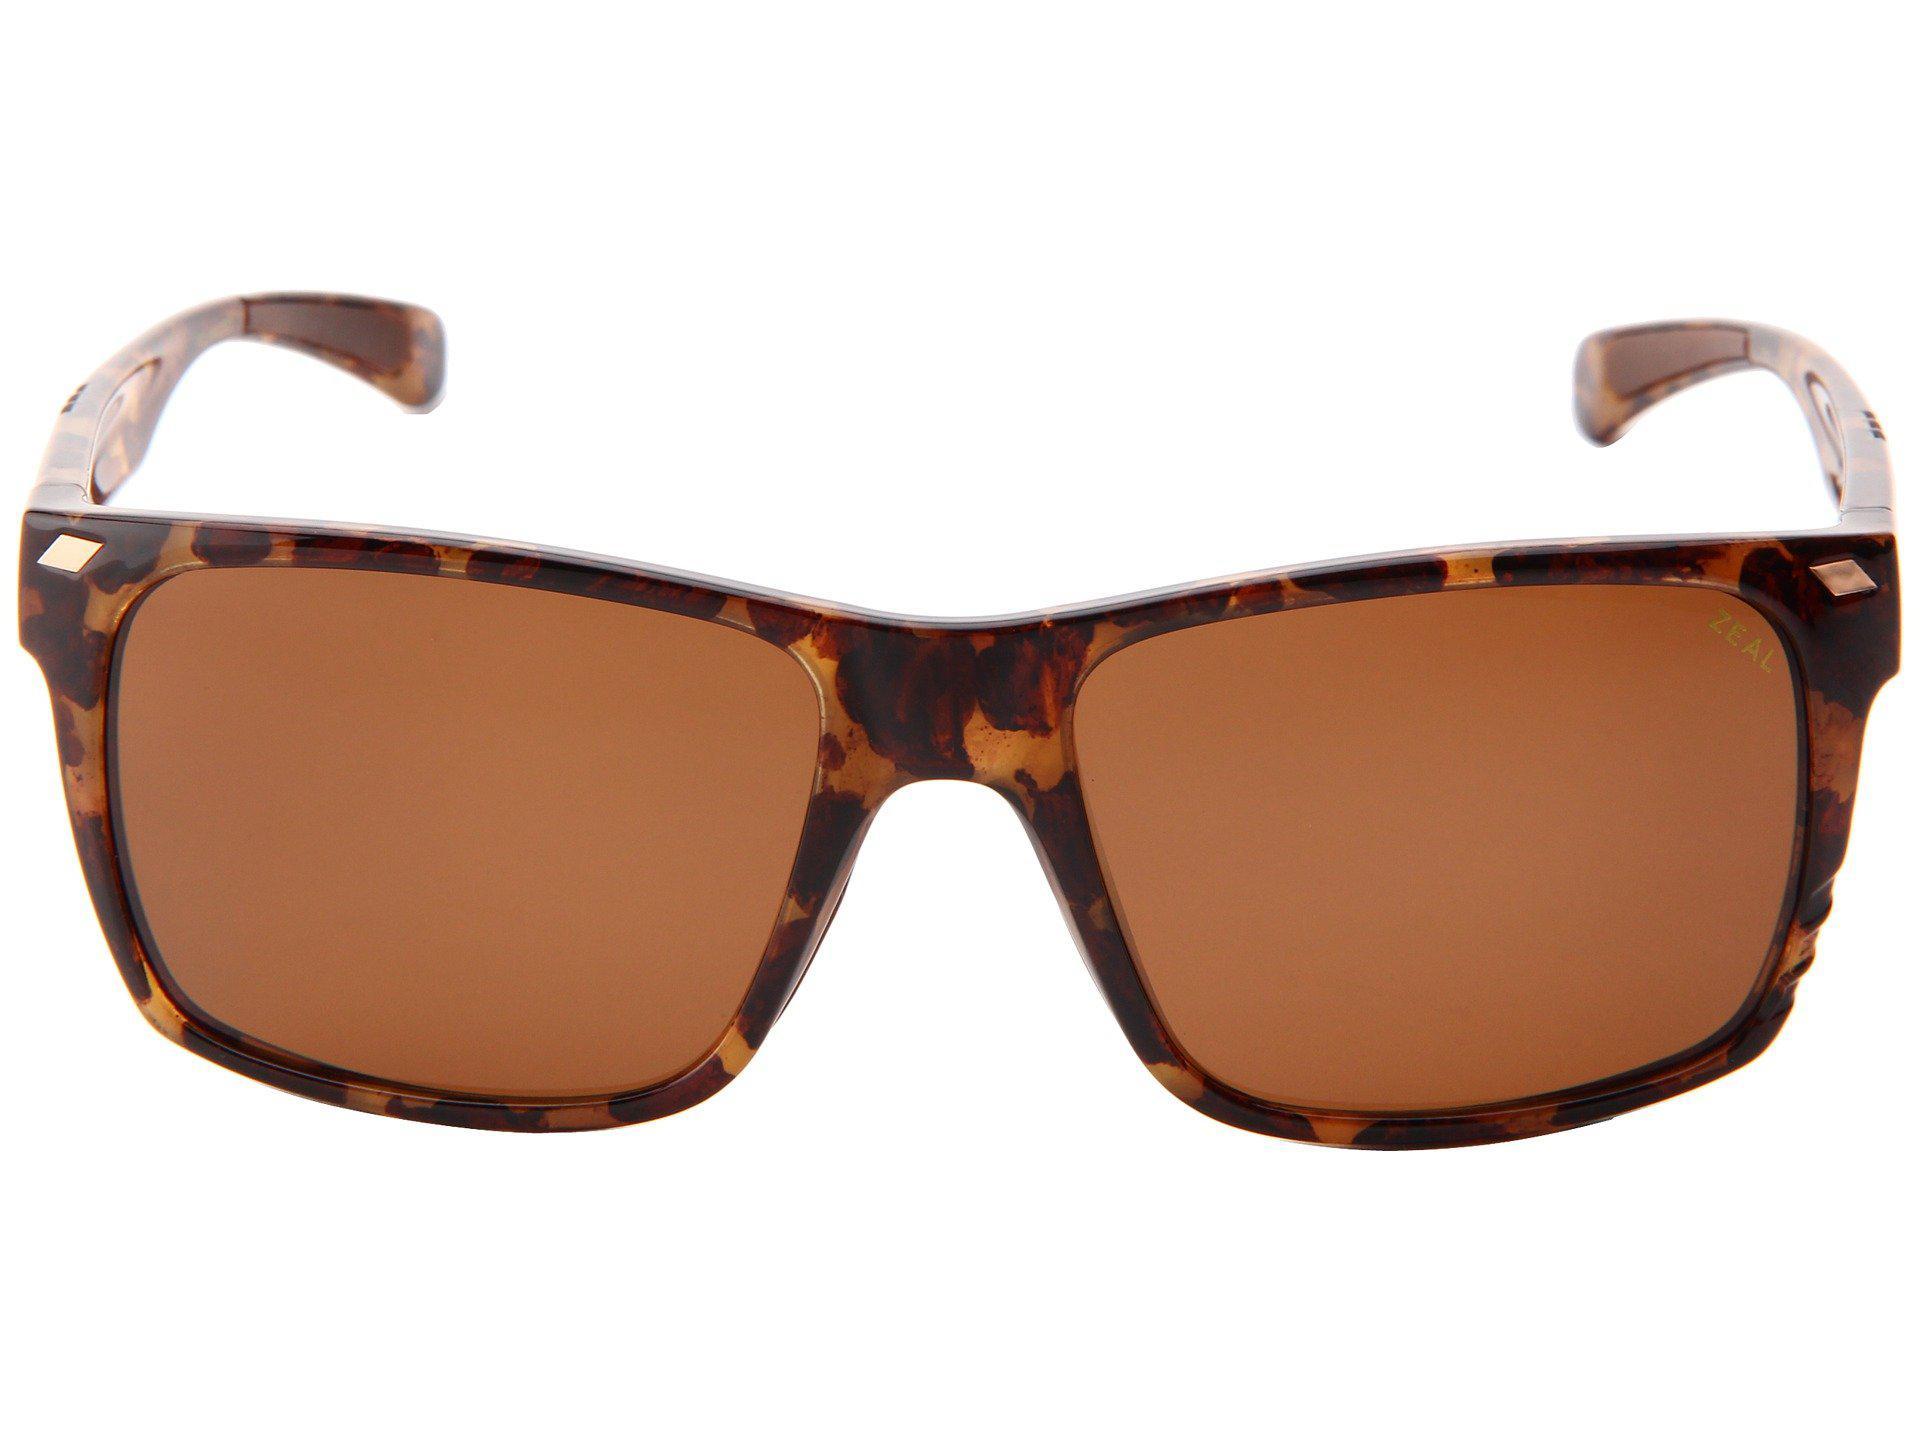 8e53234951 Zeal Optics - Brown Brewer (matte Wood Grain W   Copper Polarized Lens)  Sport. View fullscreen